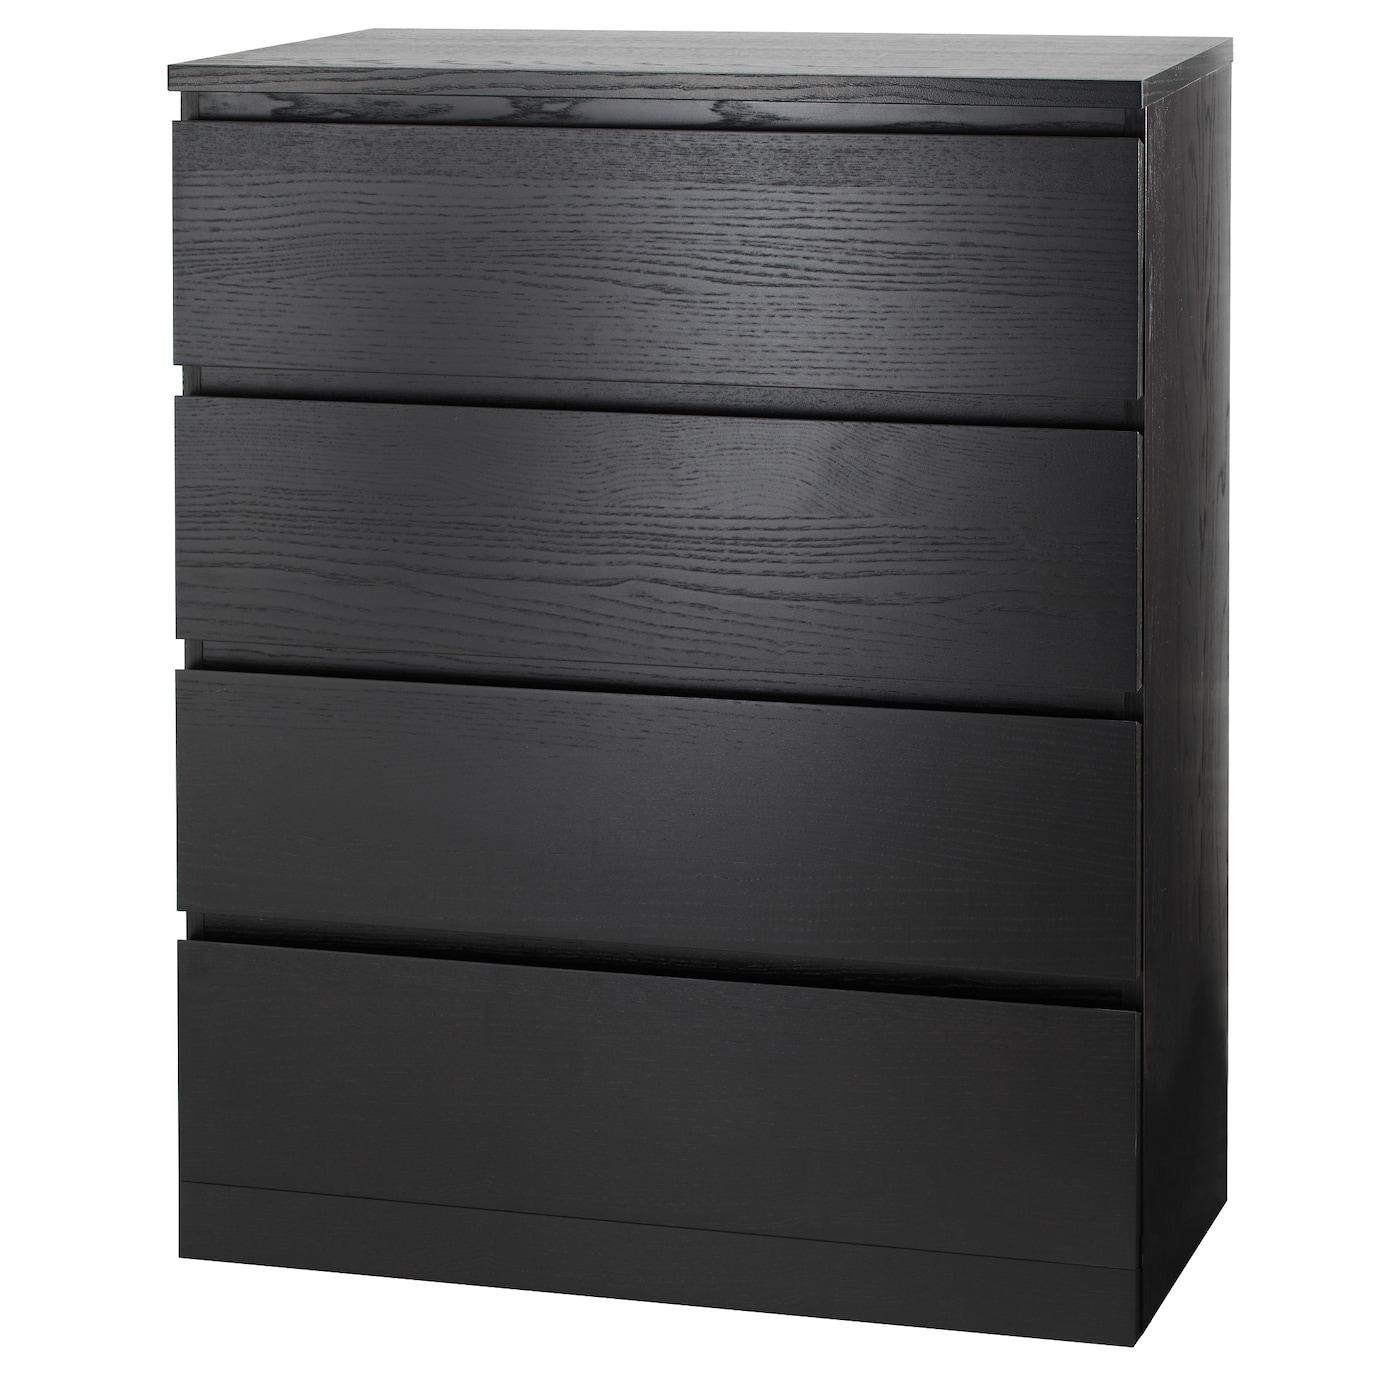 IKEA - MALM Ladekast met 4 lades - 80x100 cm - Zwartbruin